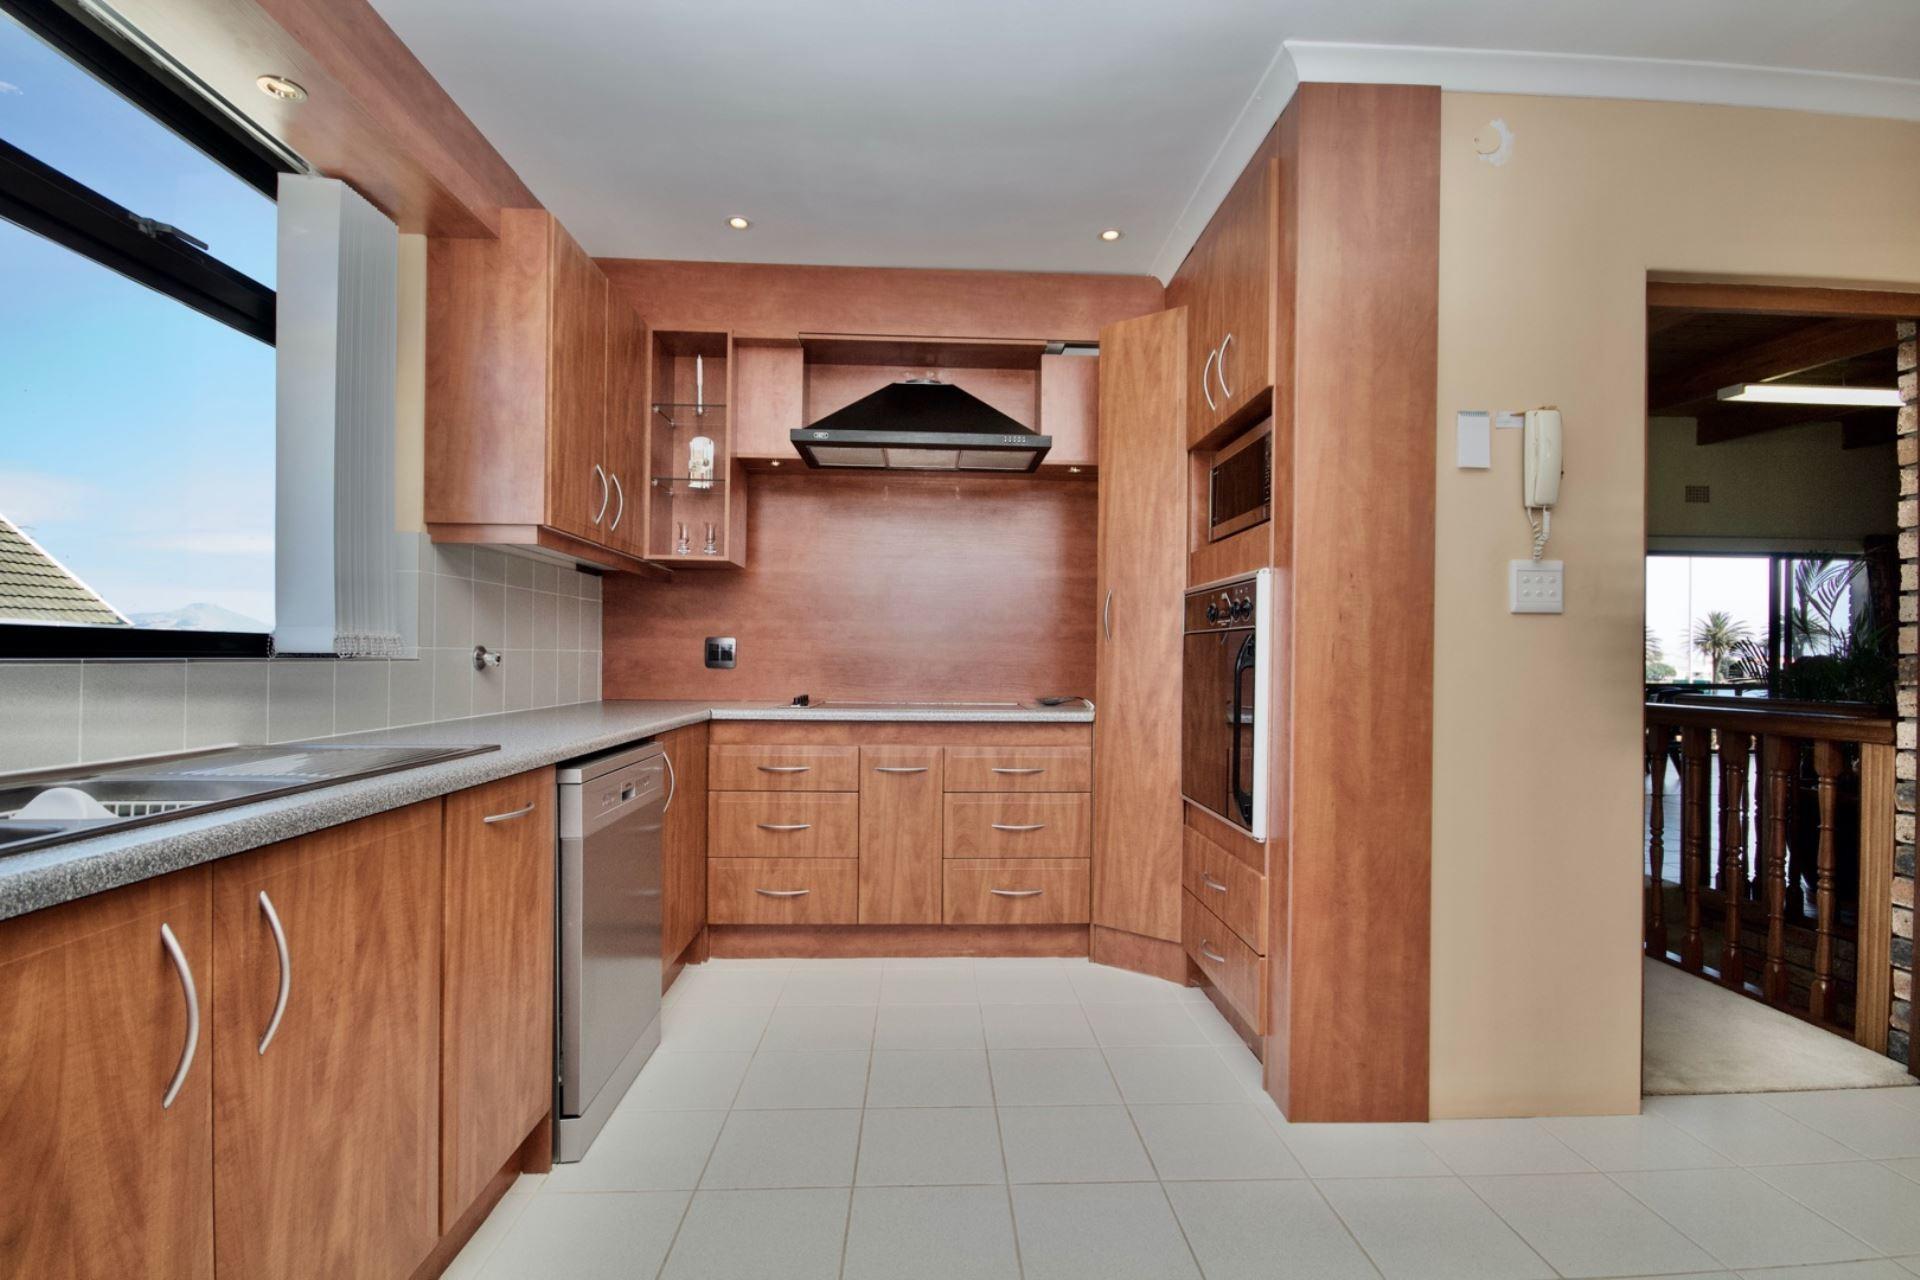 4 Bedroom House For Sale in Milnerton Central